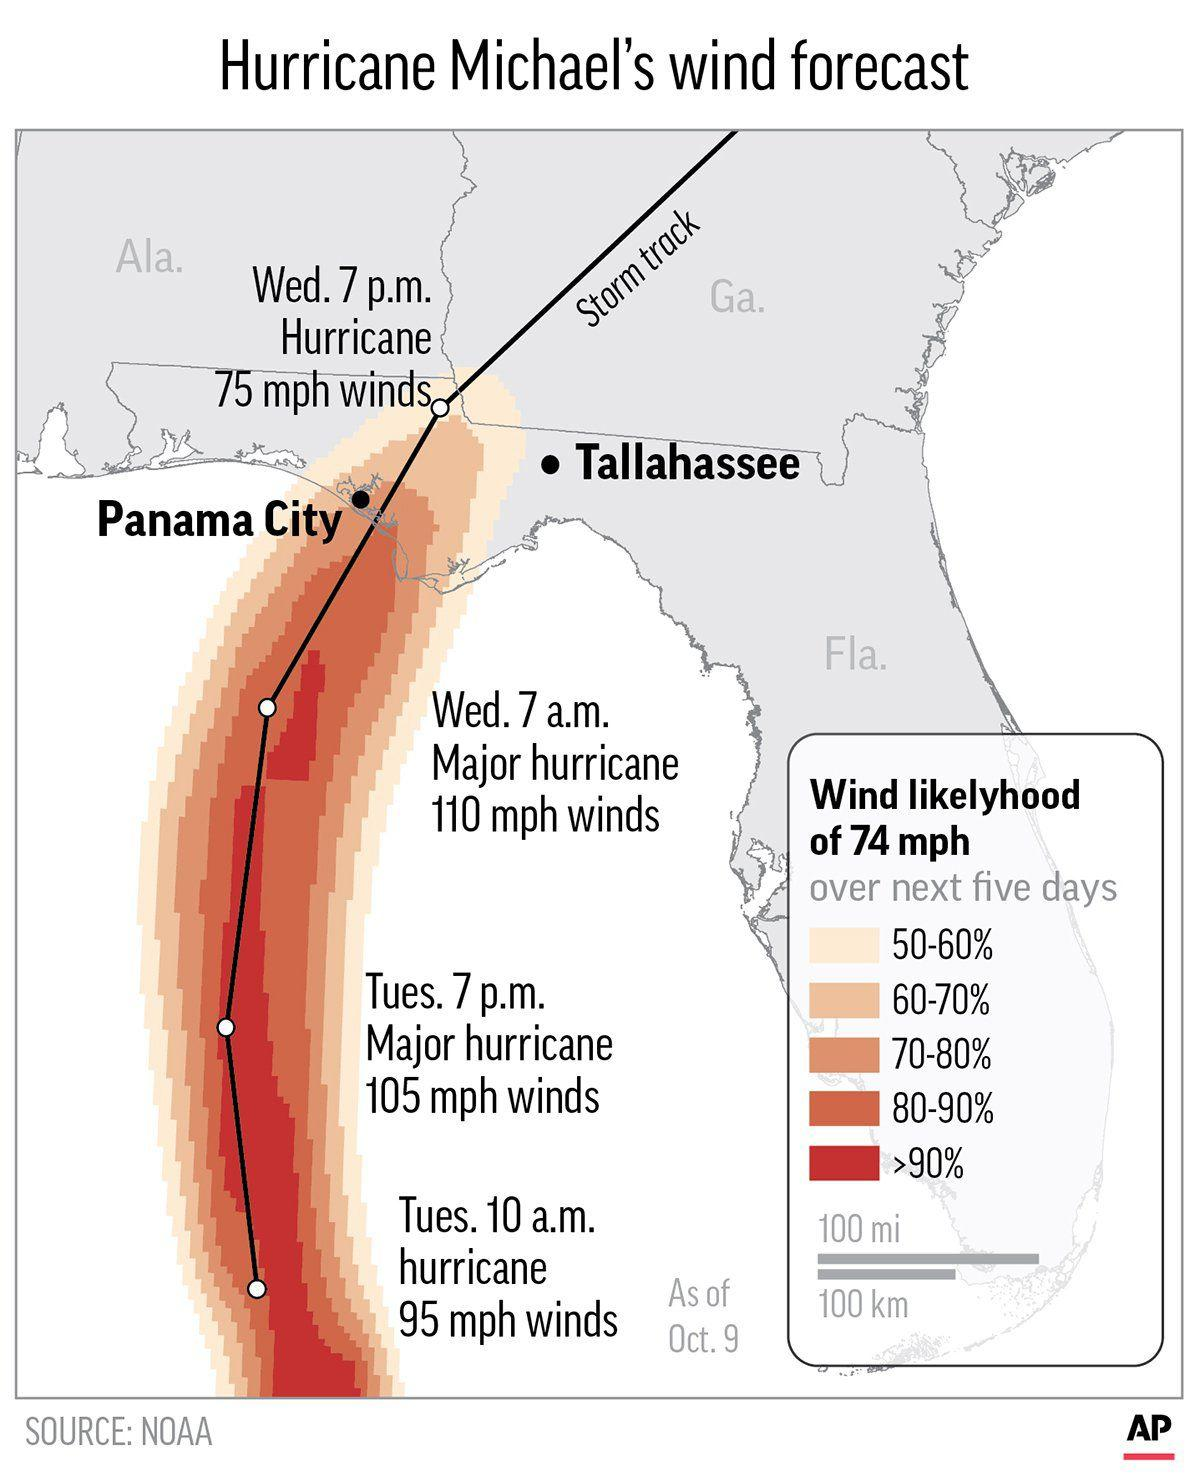 Hurricane Michael's forecast